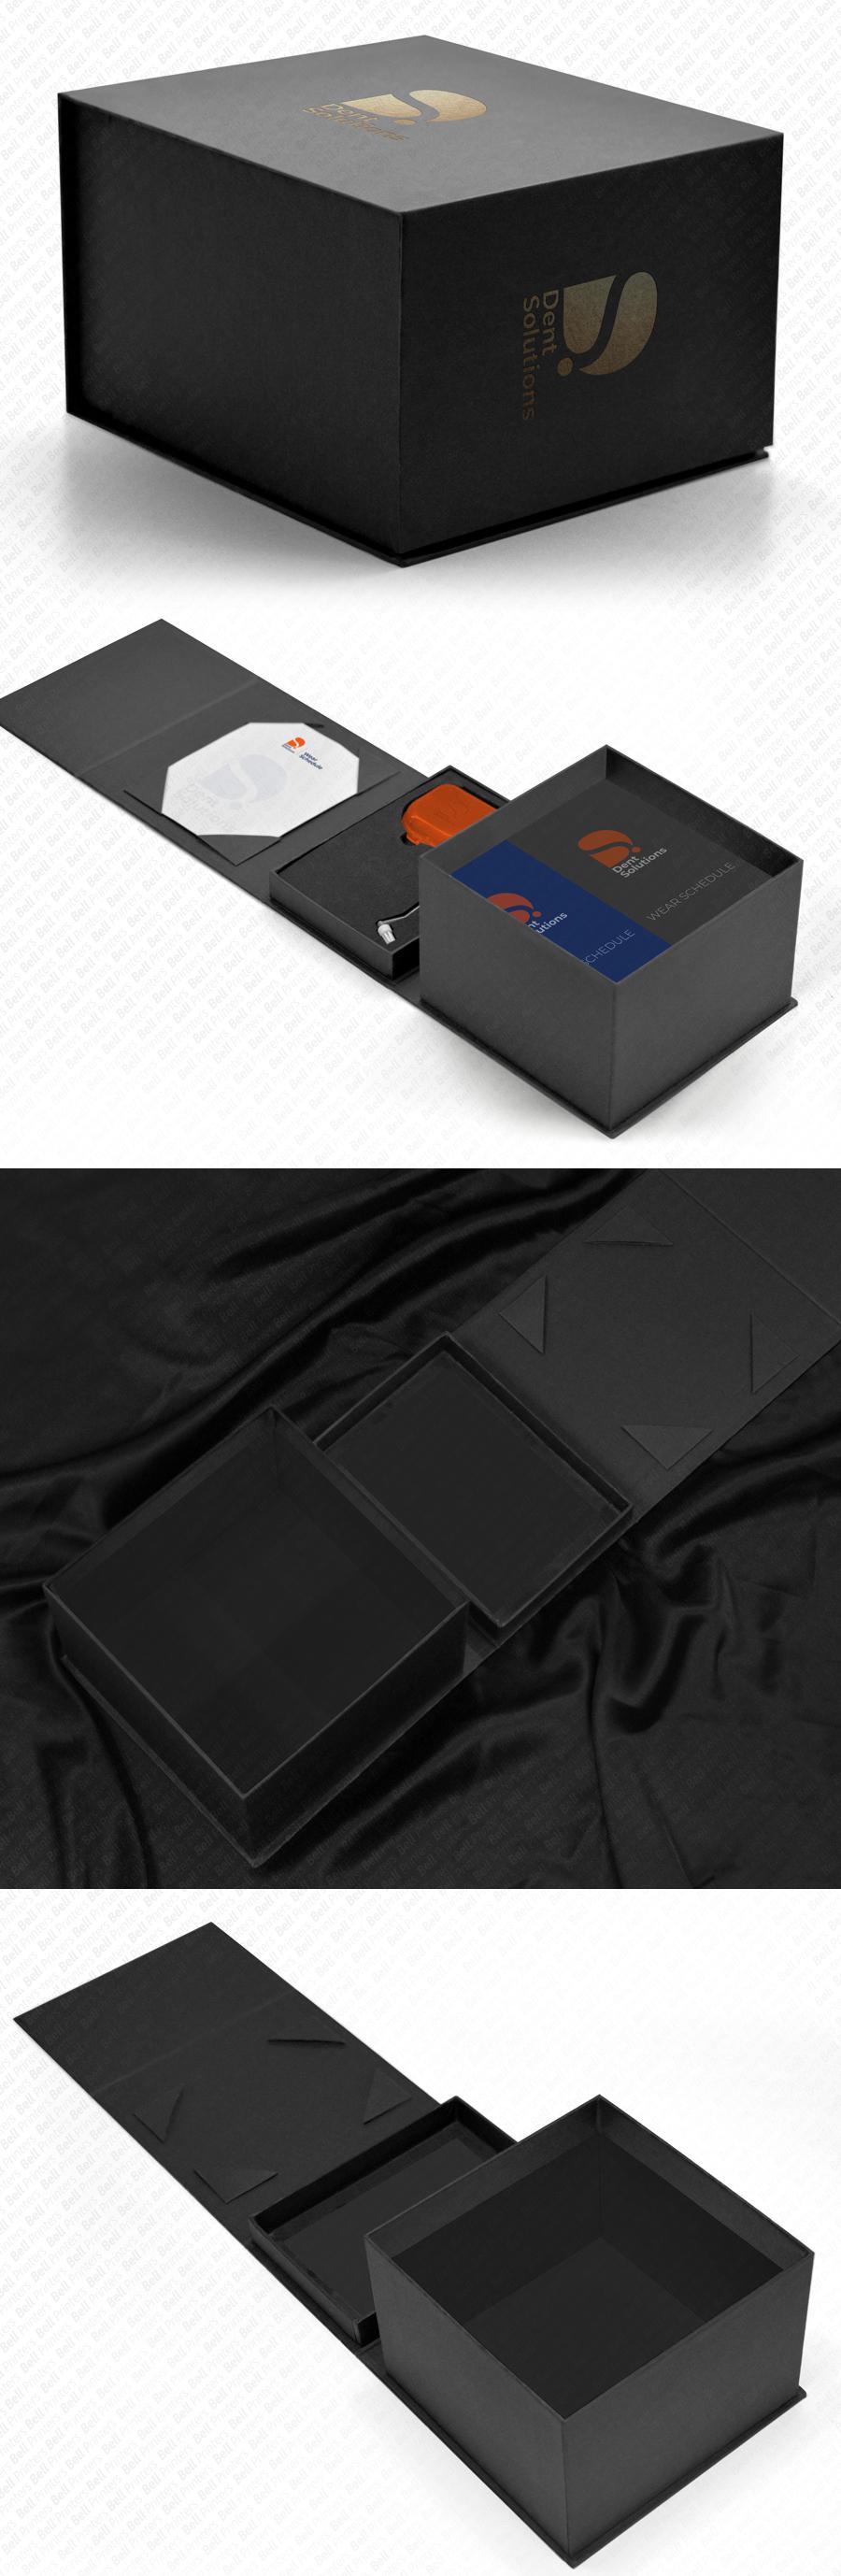 Luxury  Dental Packaging Boxes    Premium Dental accessories boxes